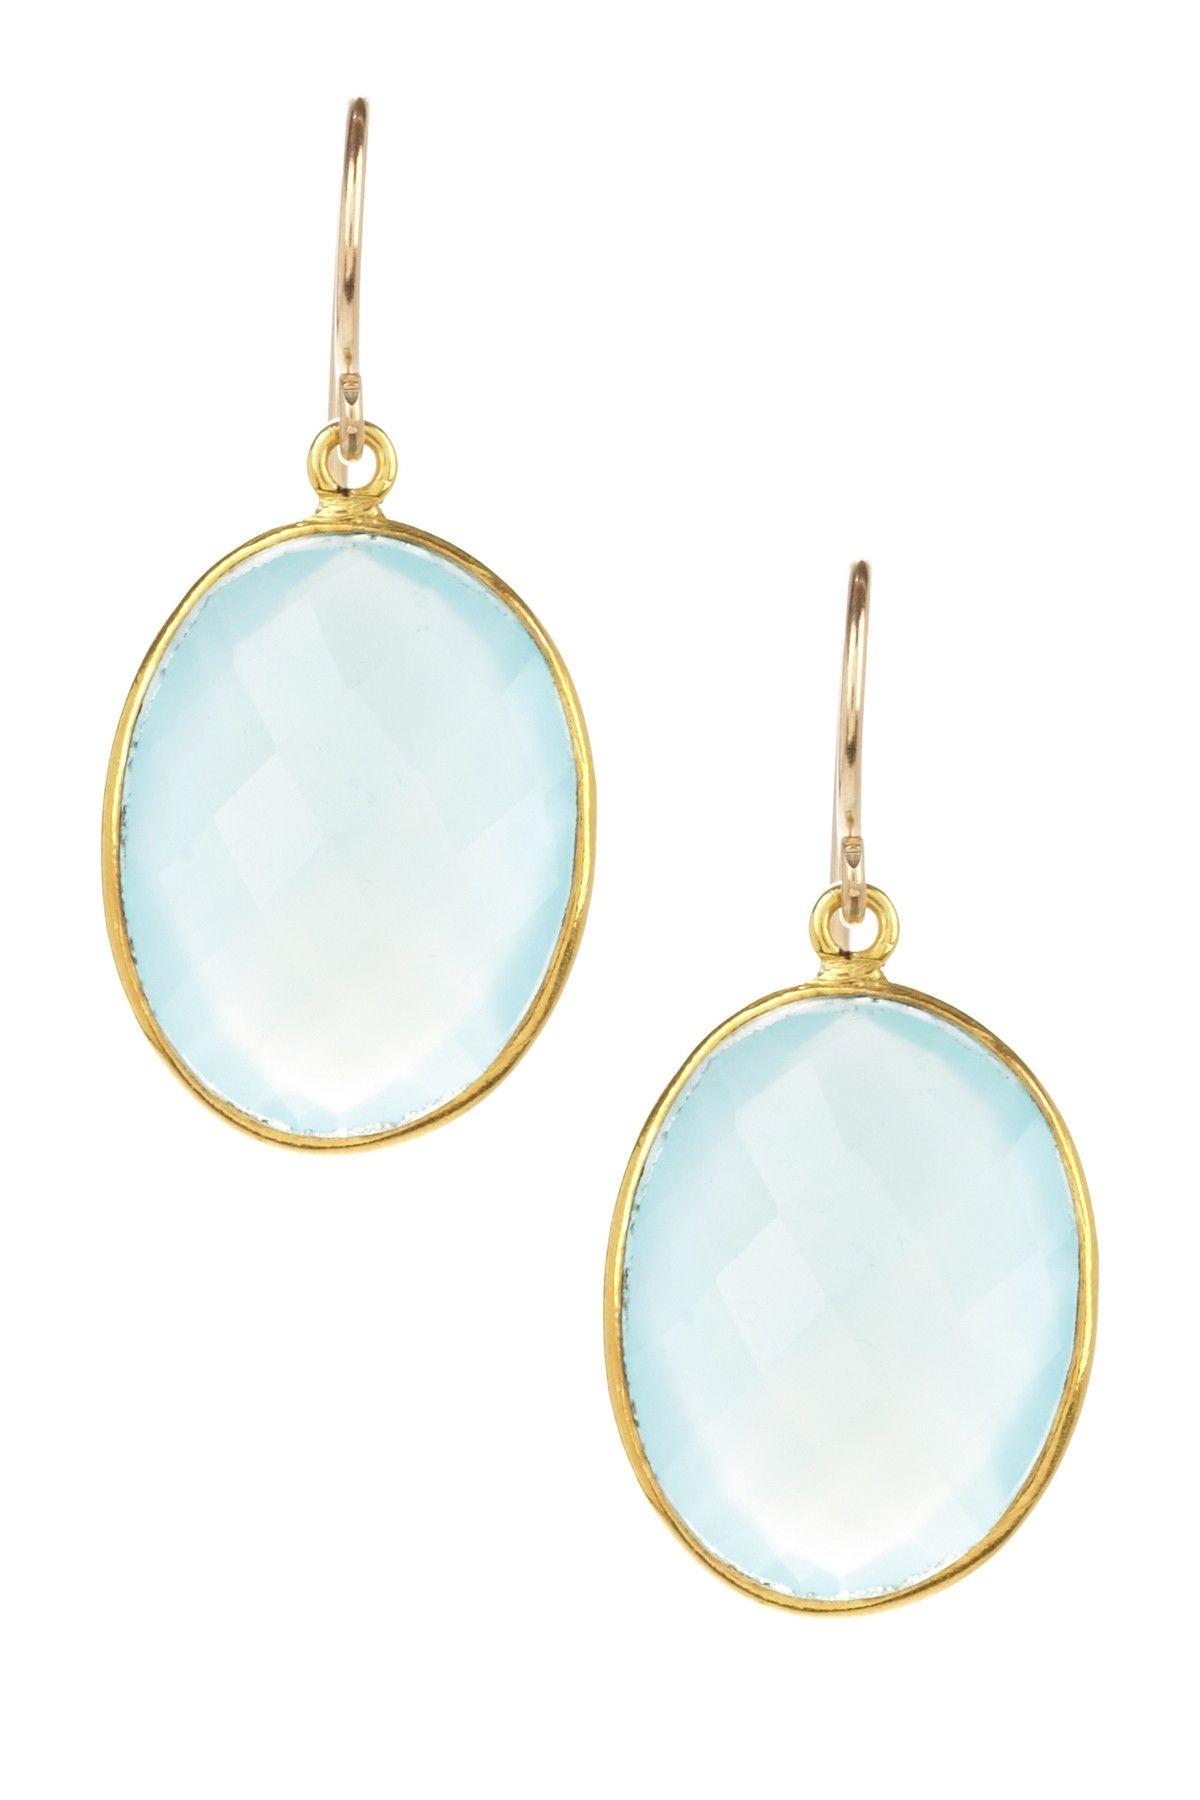 Charming Summer Jewelry Chalcedony Drop Earrings